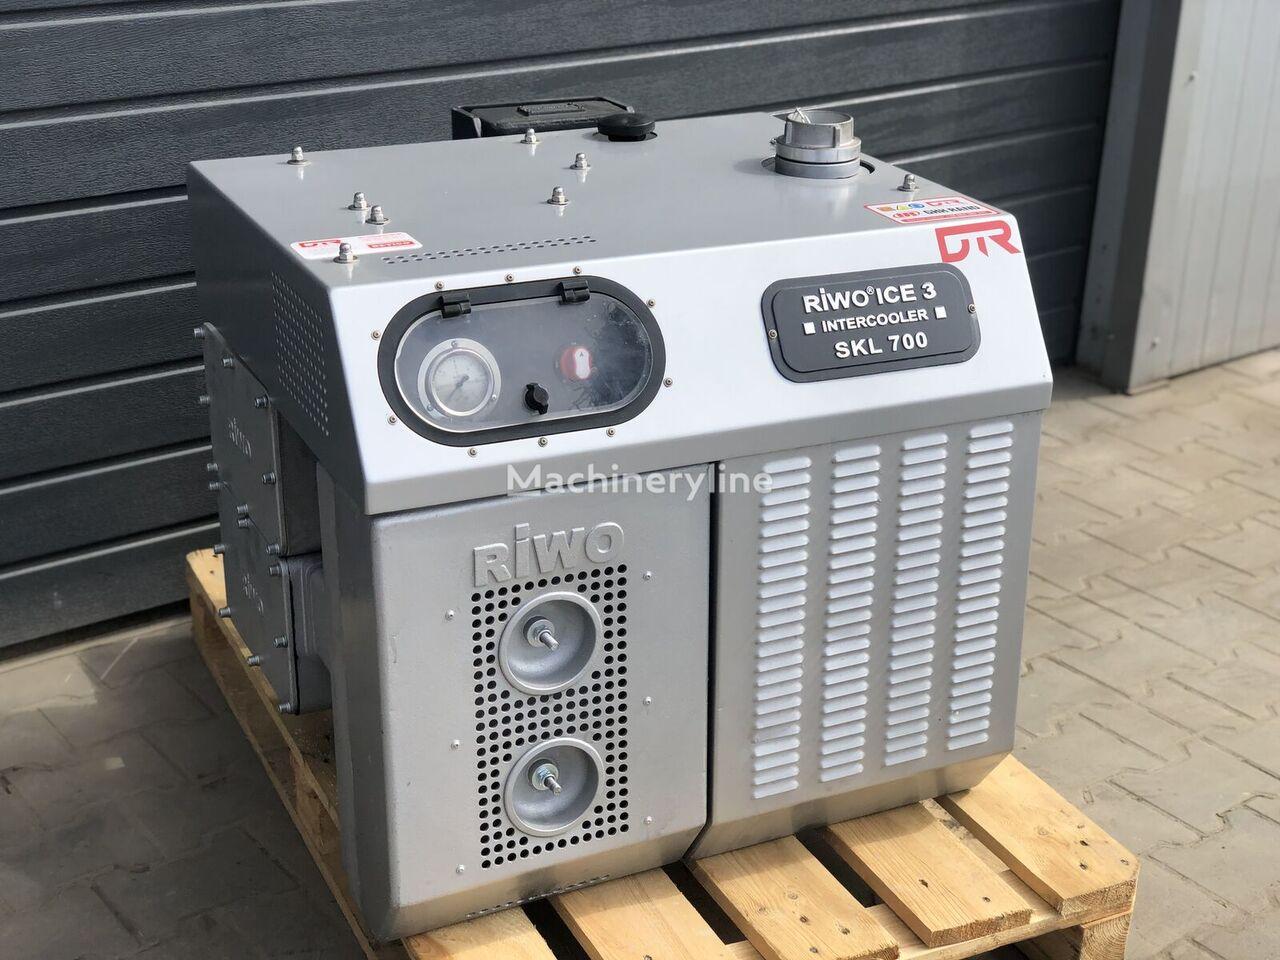 компресор Silocompressor CVS SiloKing700 nie ghh Blackmer